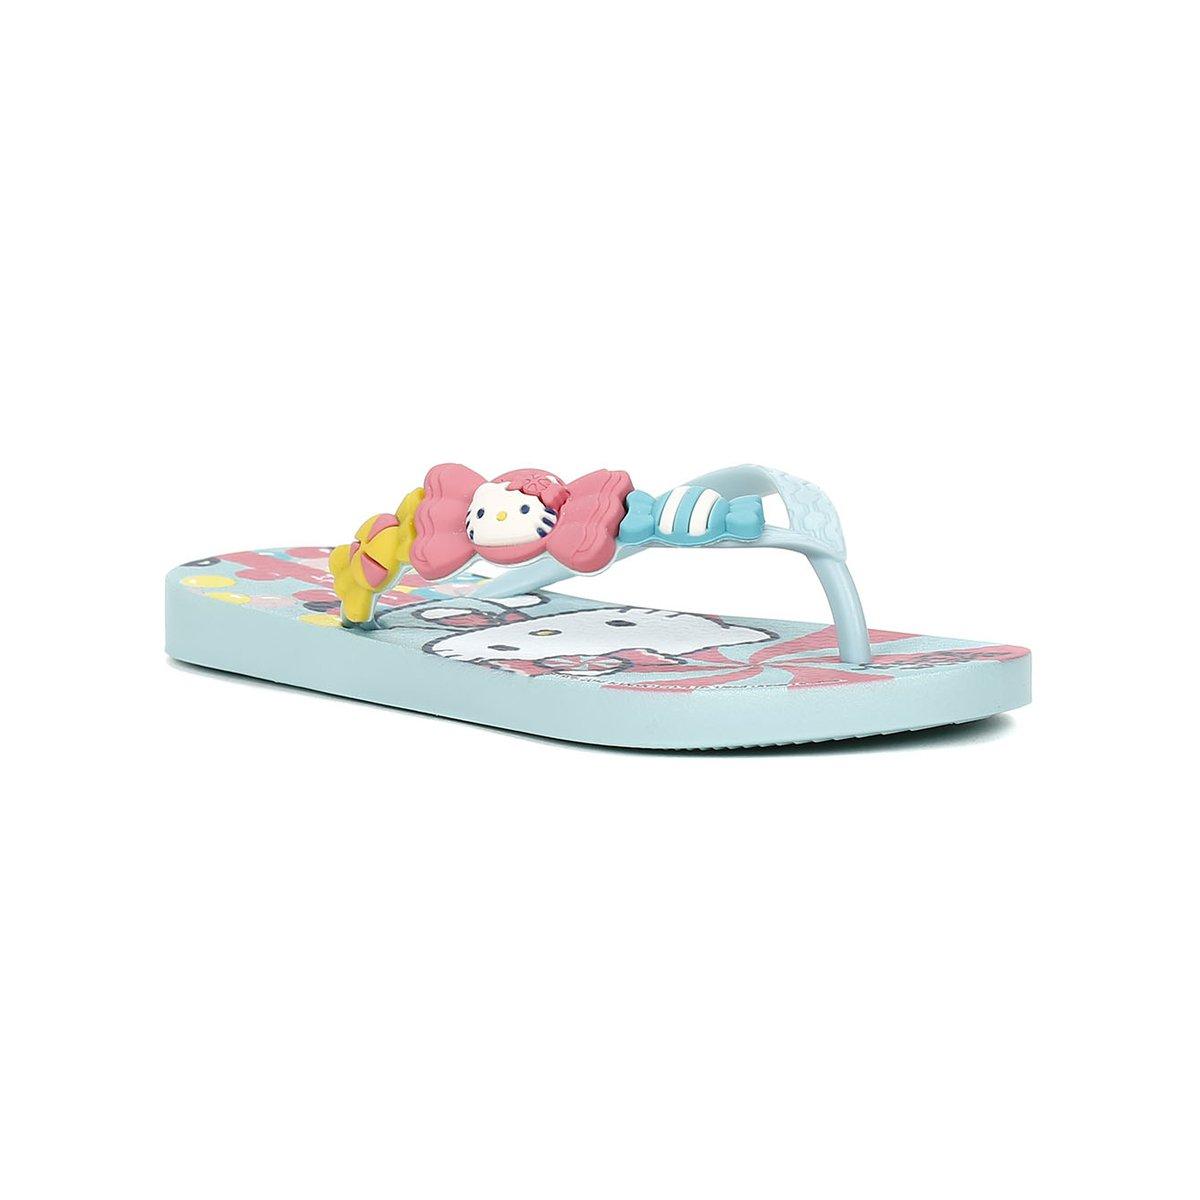 aaf76c5115 Chinelo Infantil Para Menina Hello Kitty - Verde - Compre Agora ...